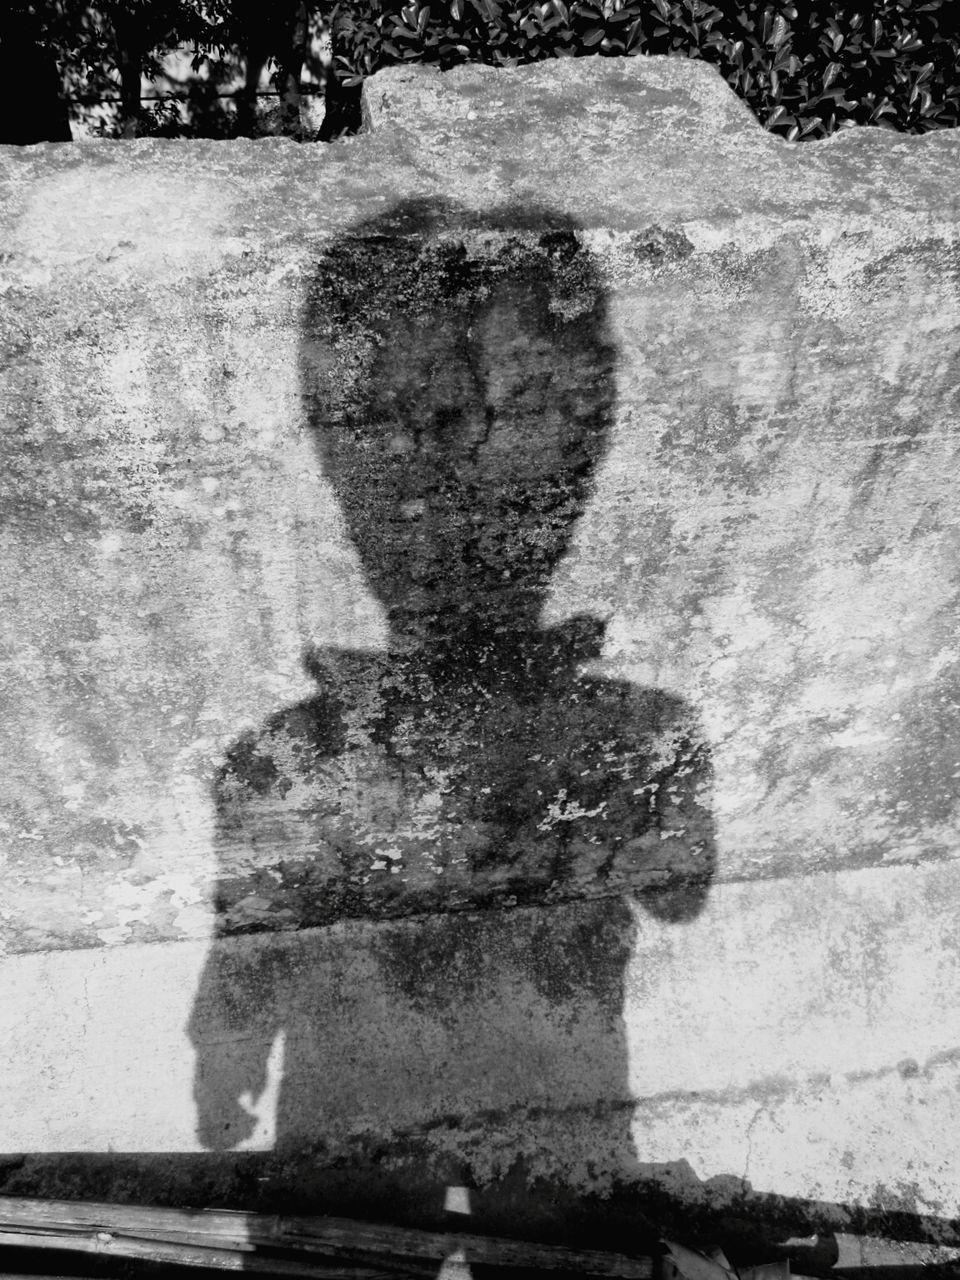 Shadow Of Man On Retaining Wall